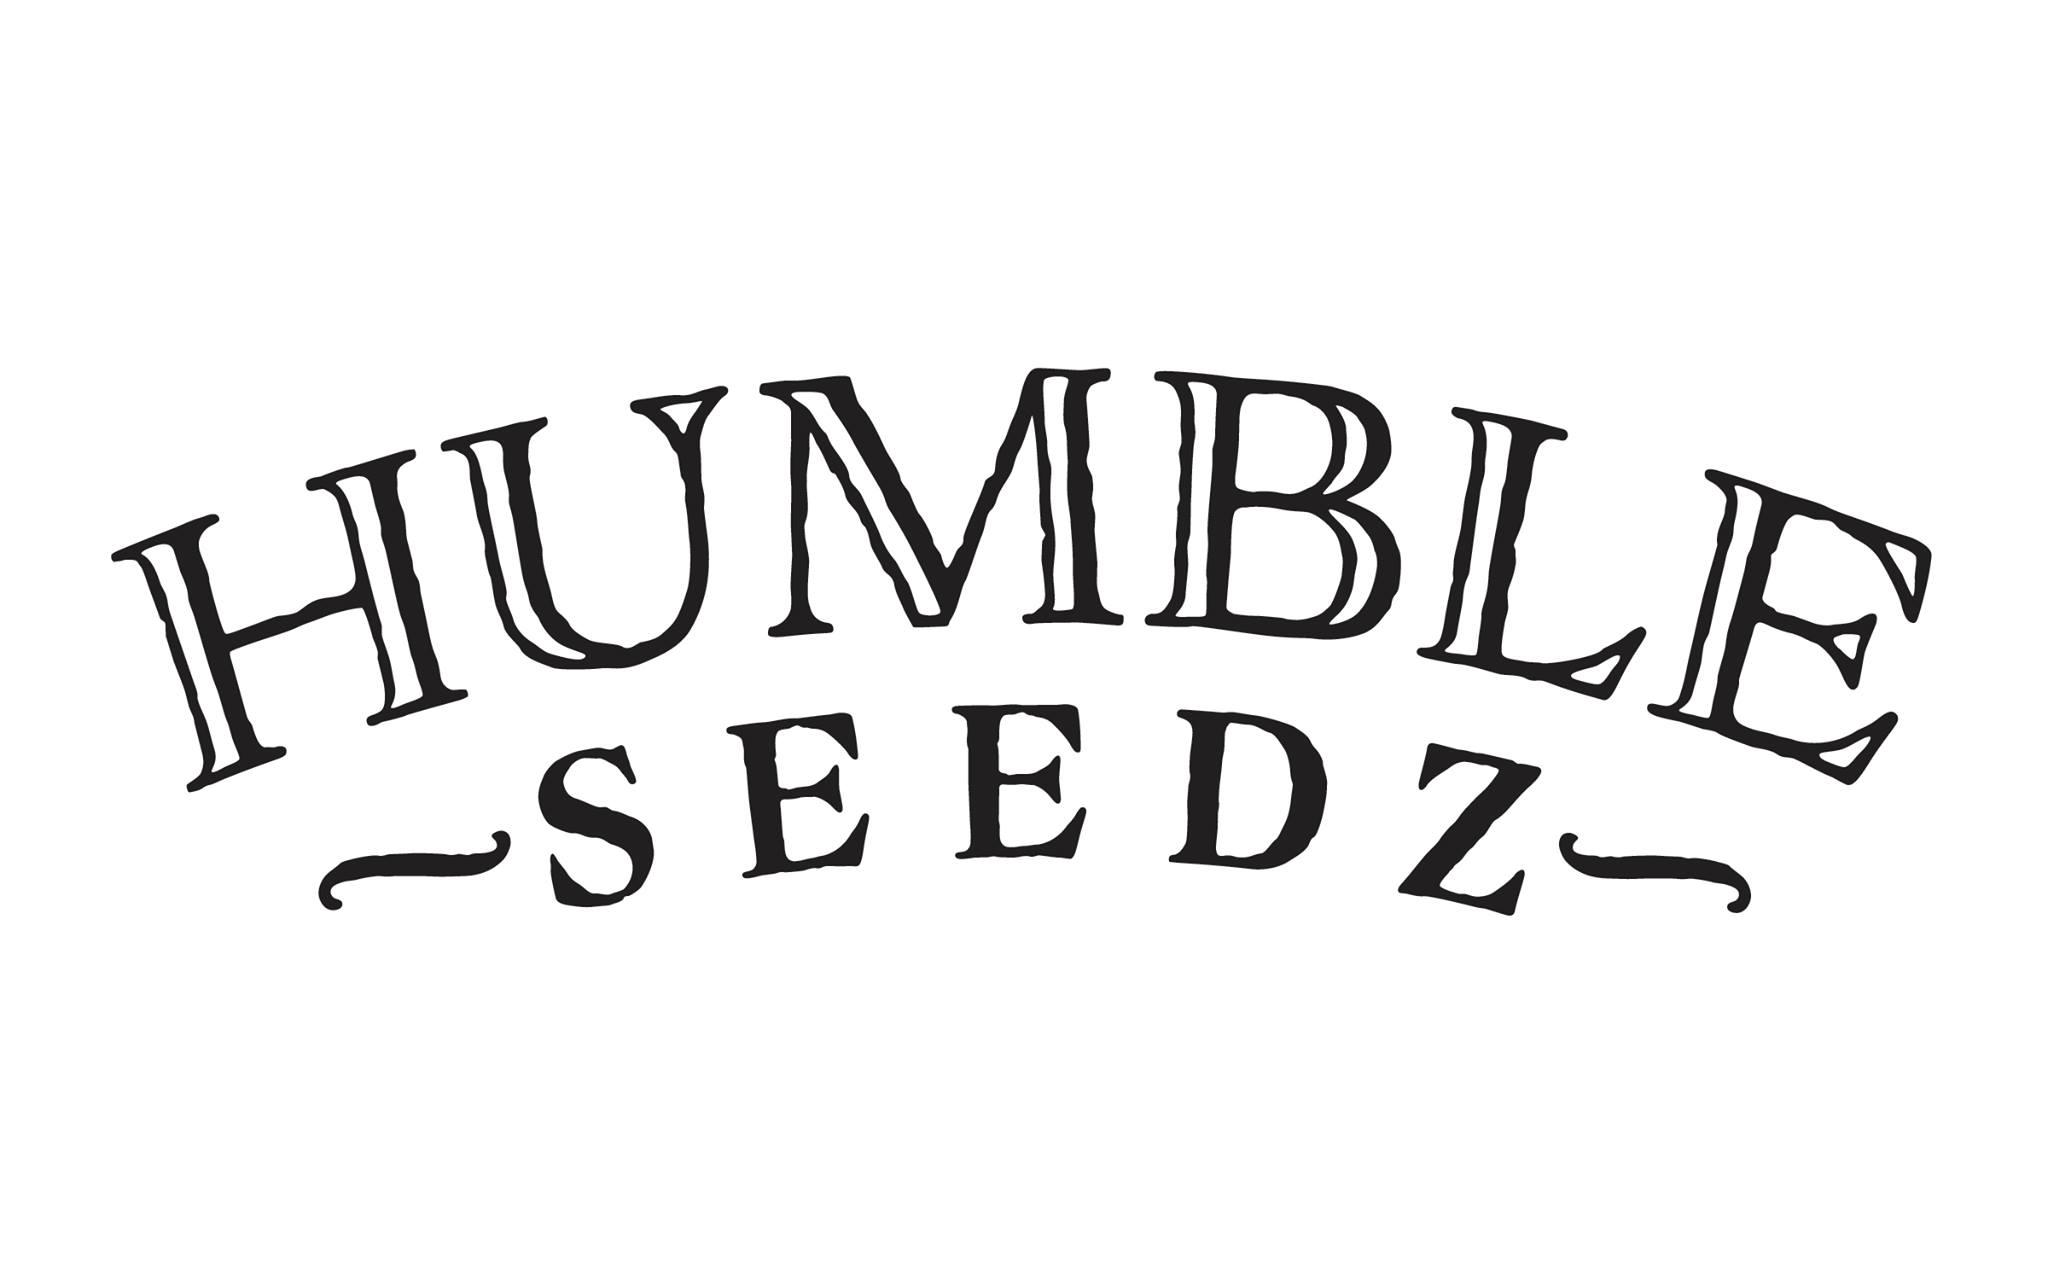 Humble Seedz